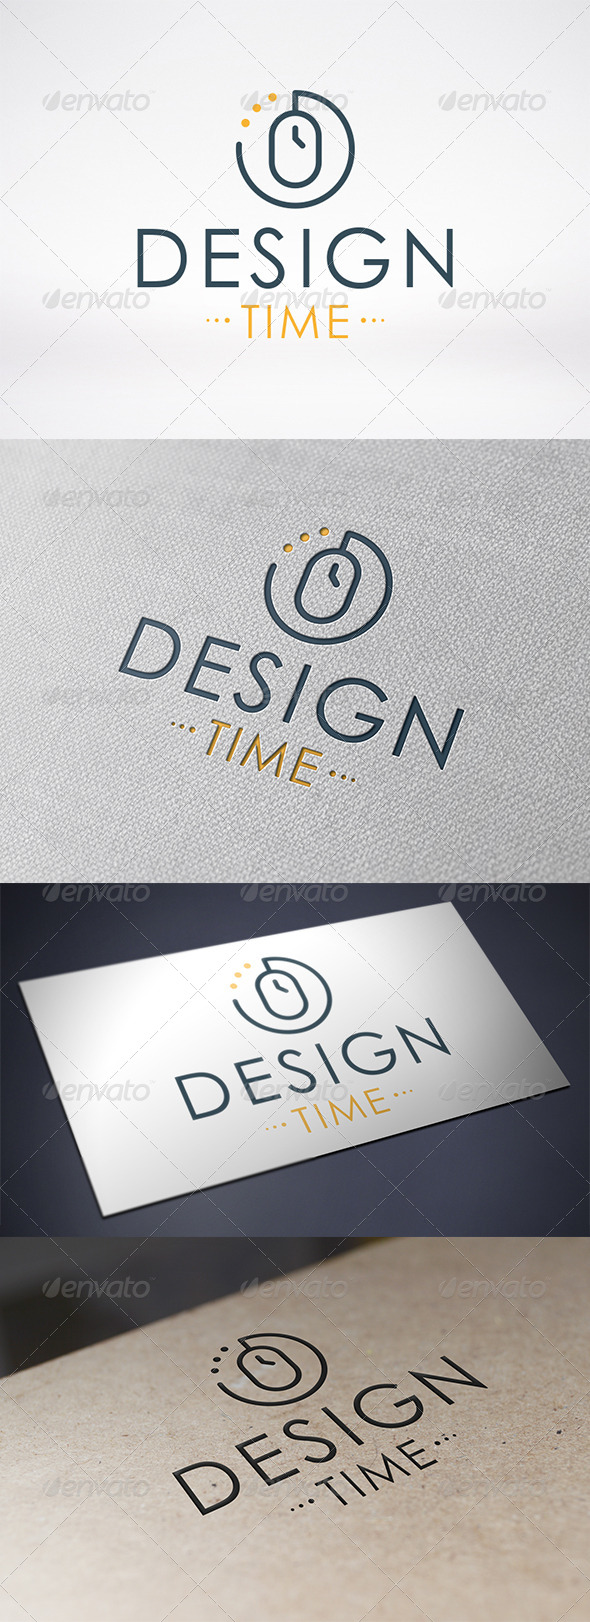 GraphicRiver Design Time Logo Template 6328641